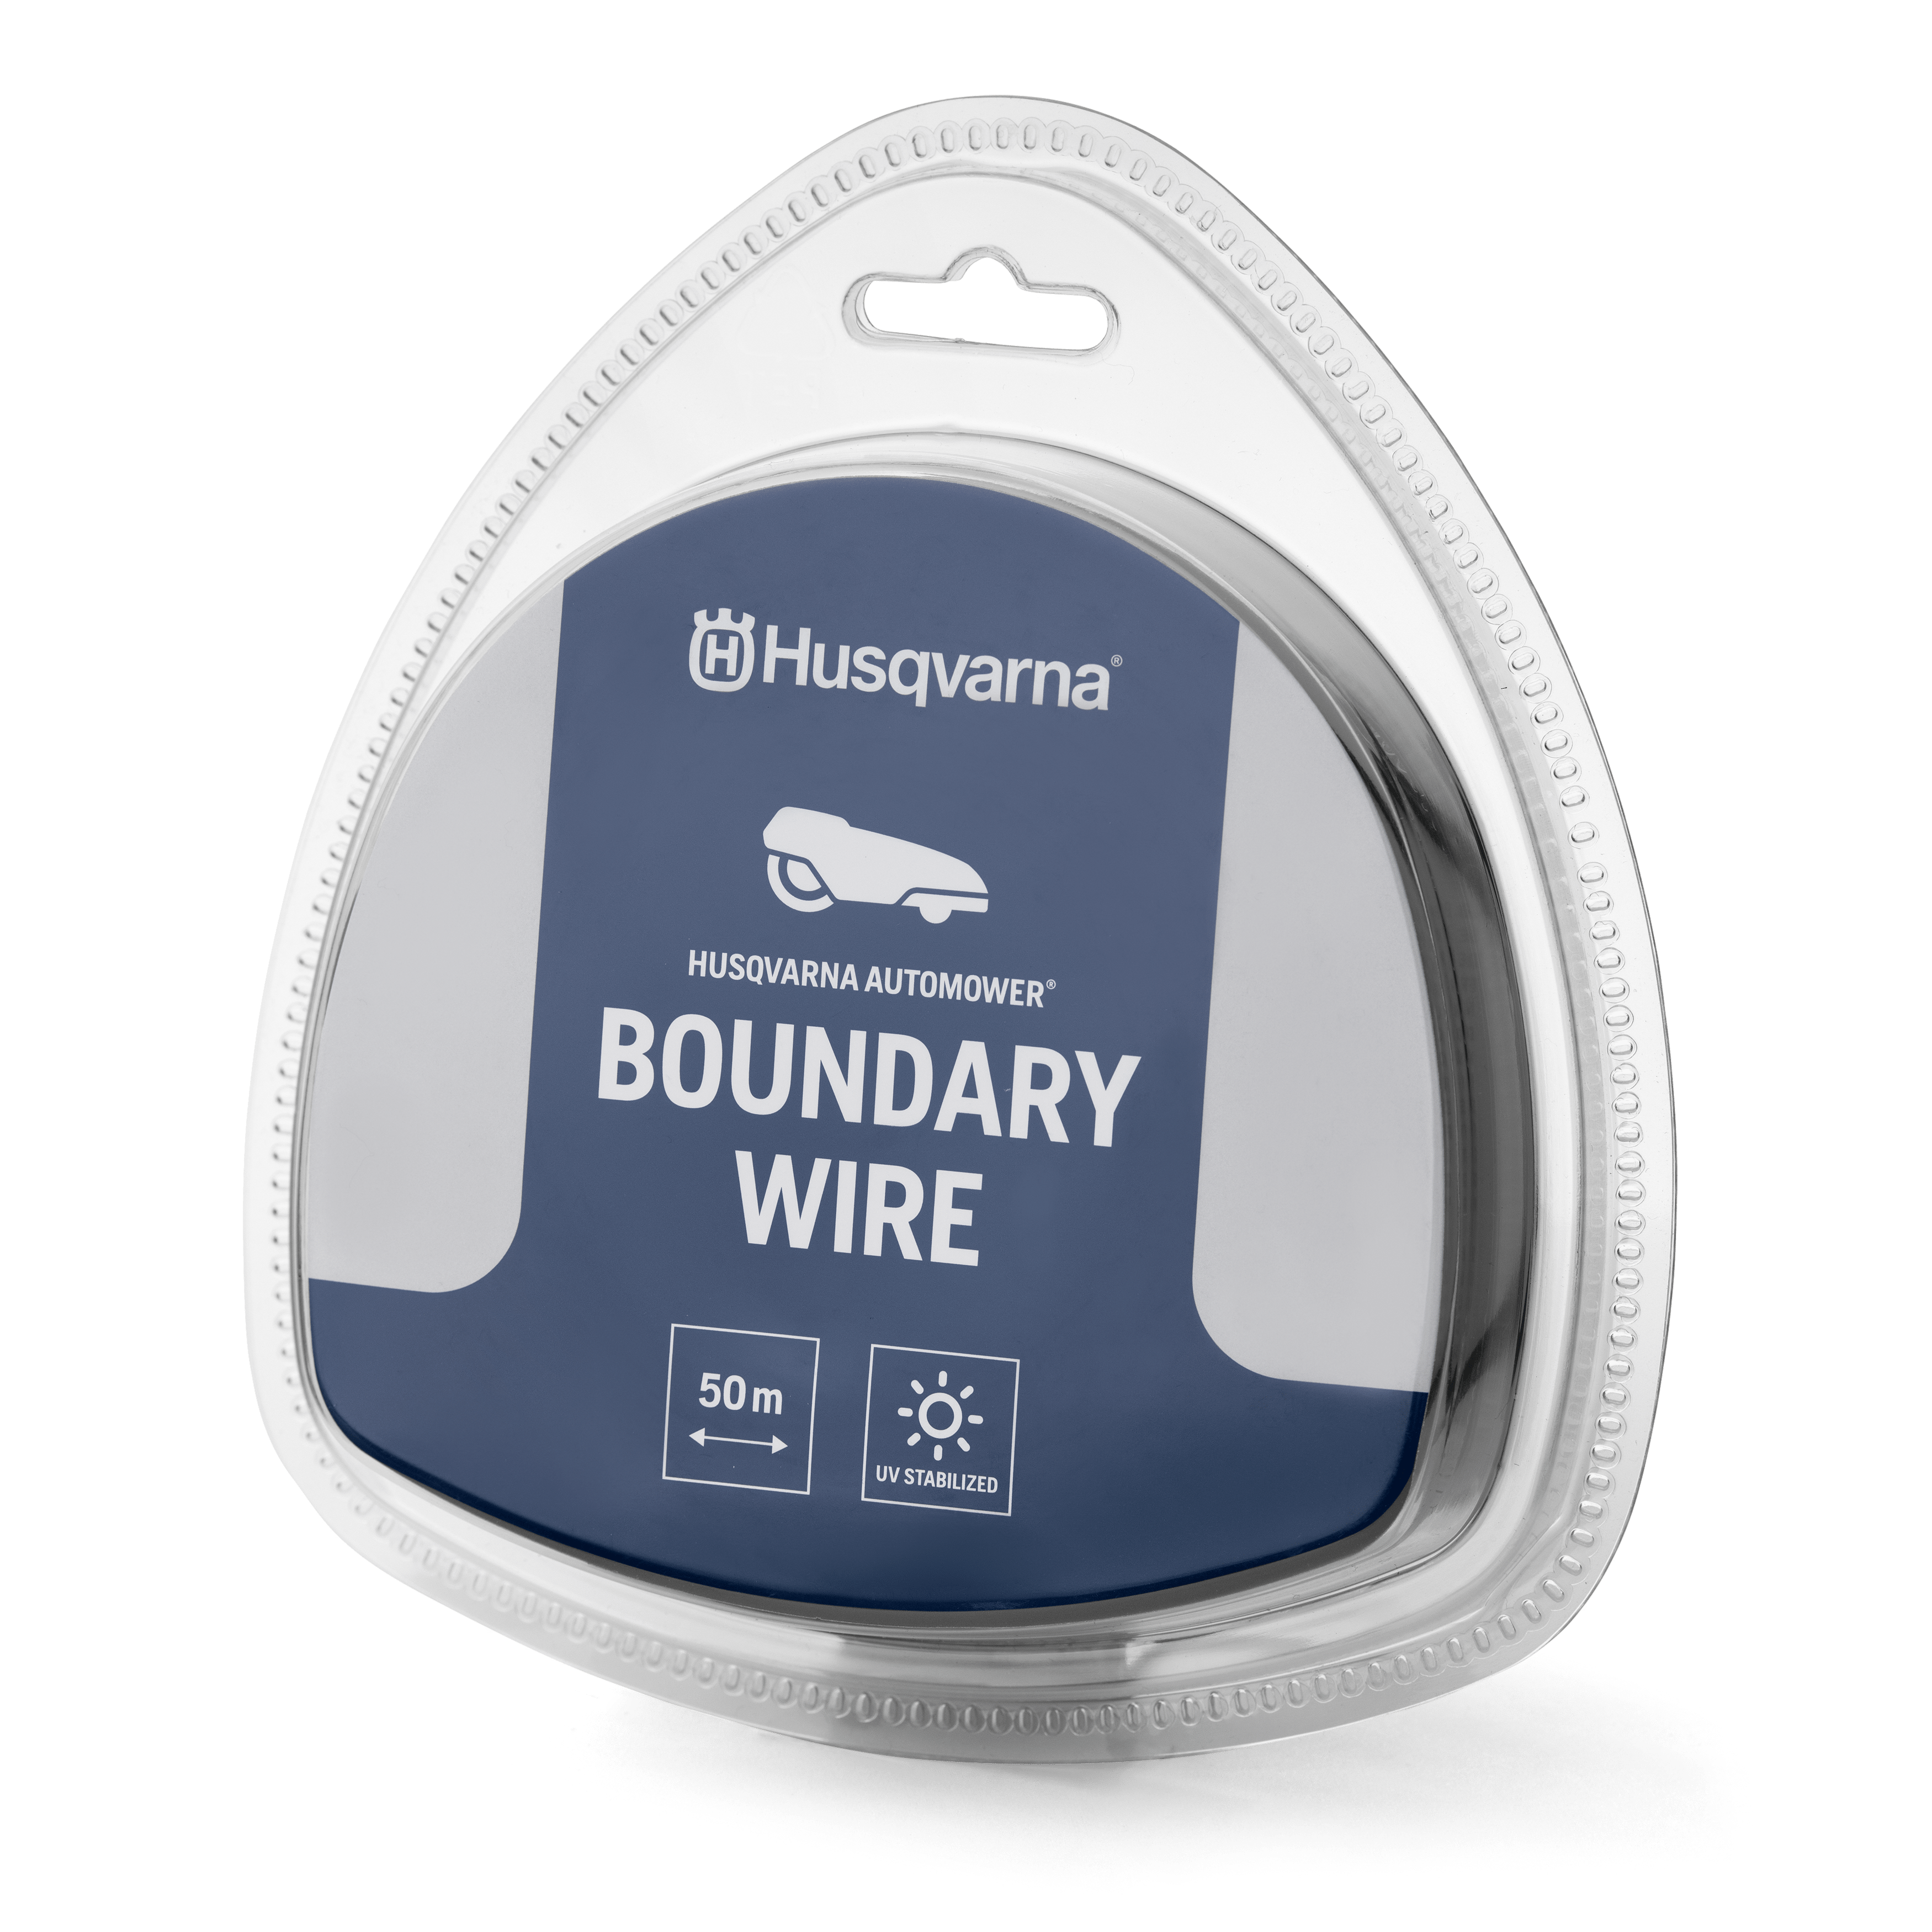 HUSQVARNA Boundary wire Standard ¯2,7mm - V-Pro Power Equipment